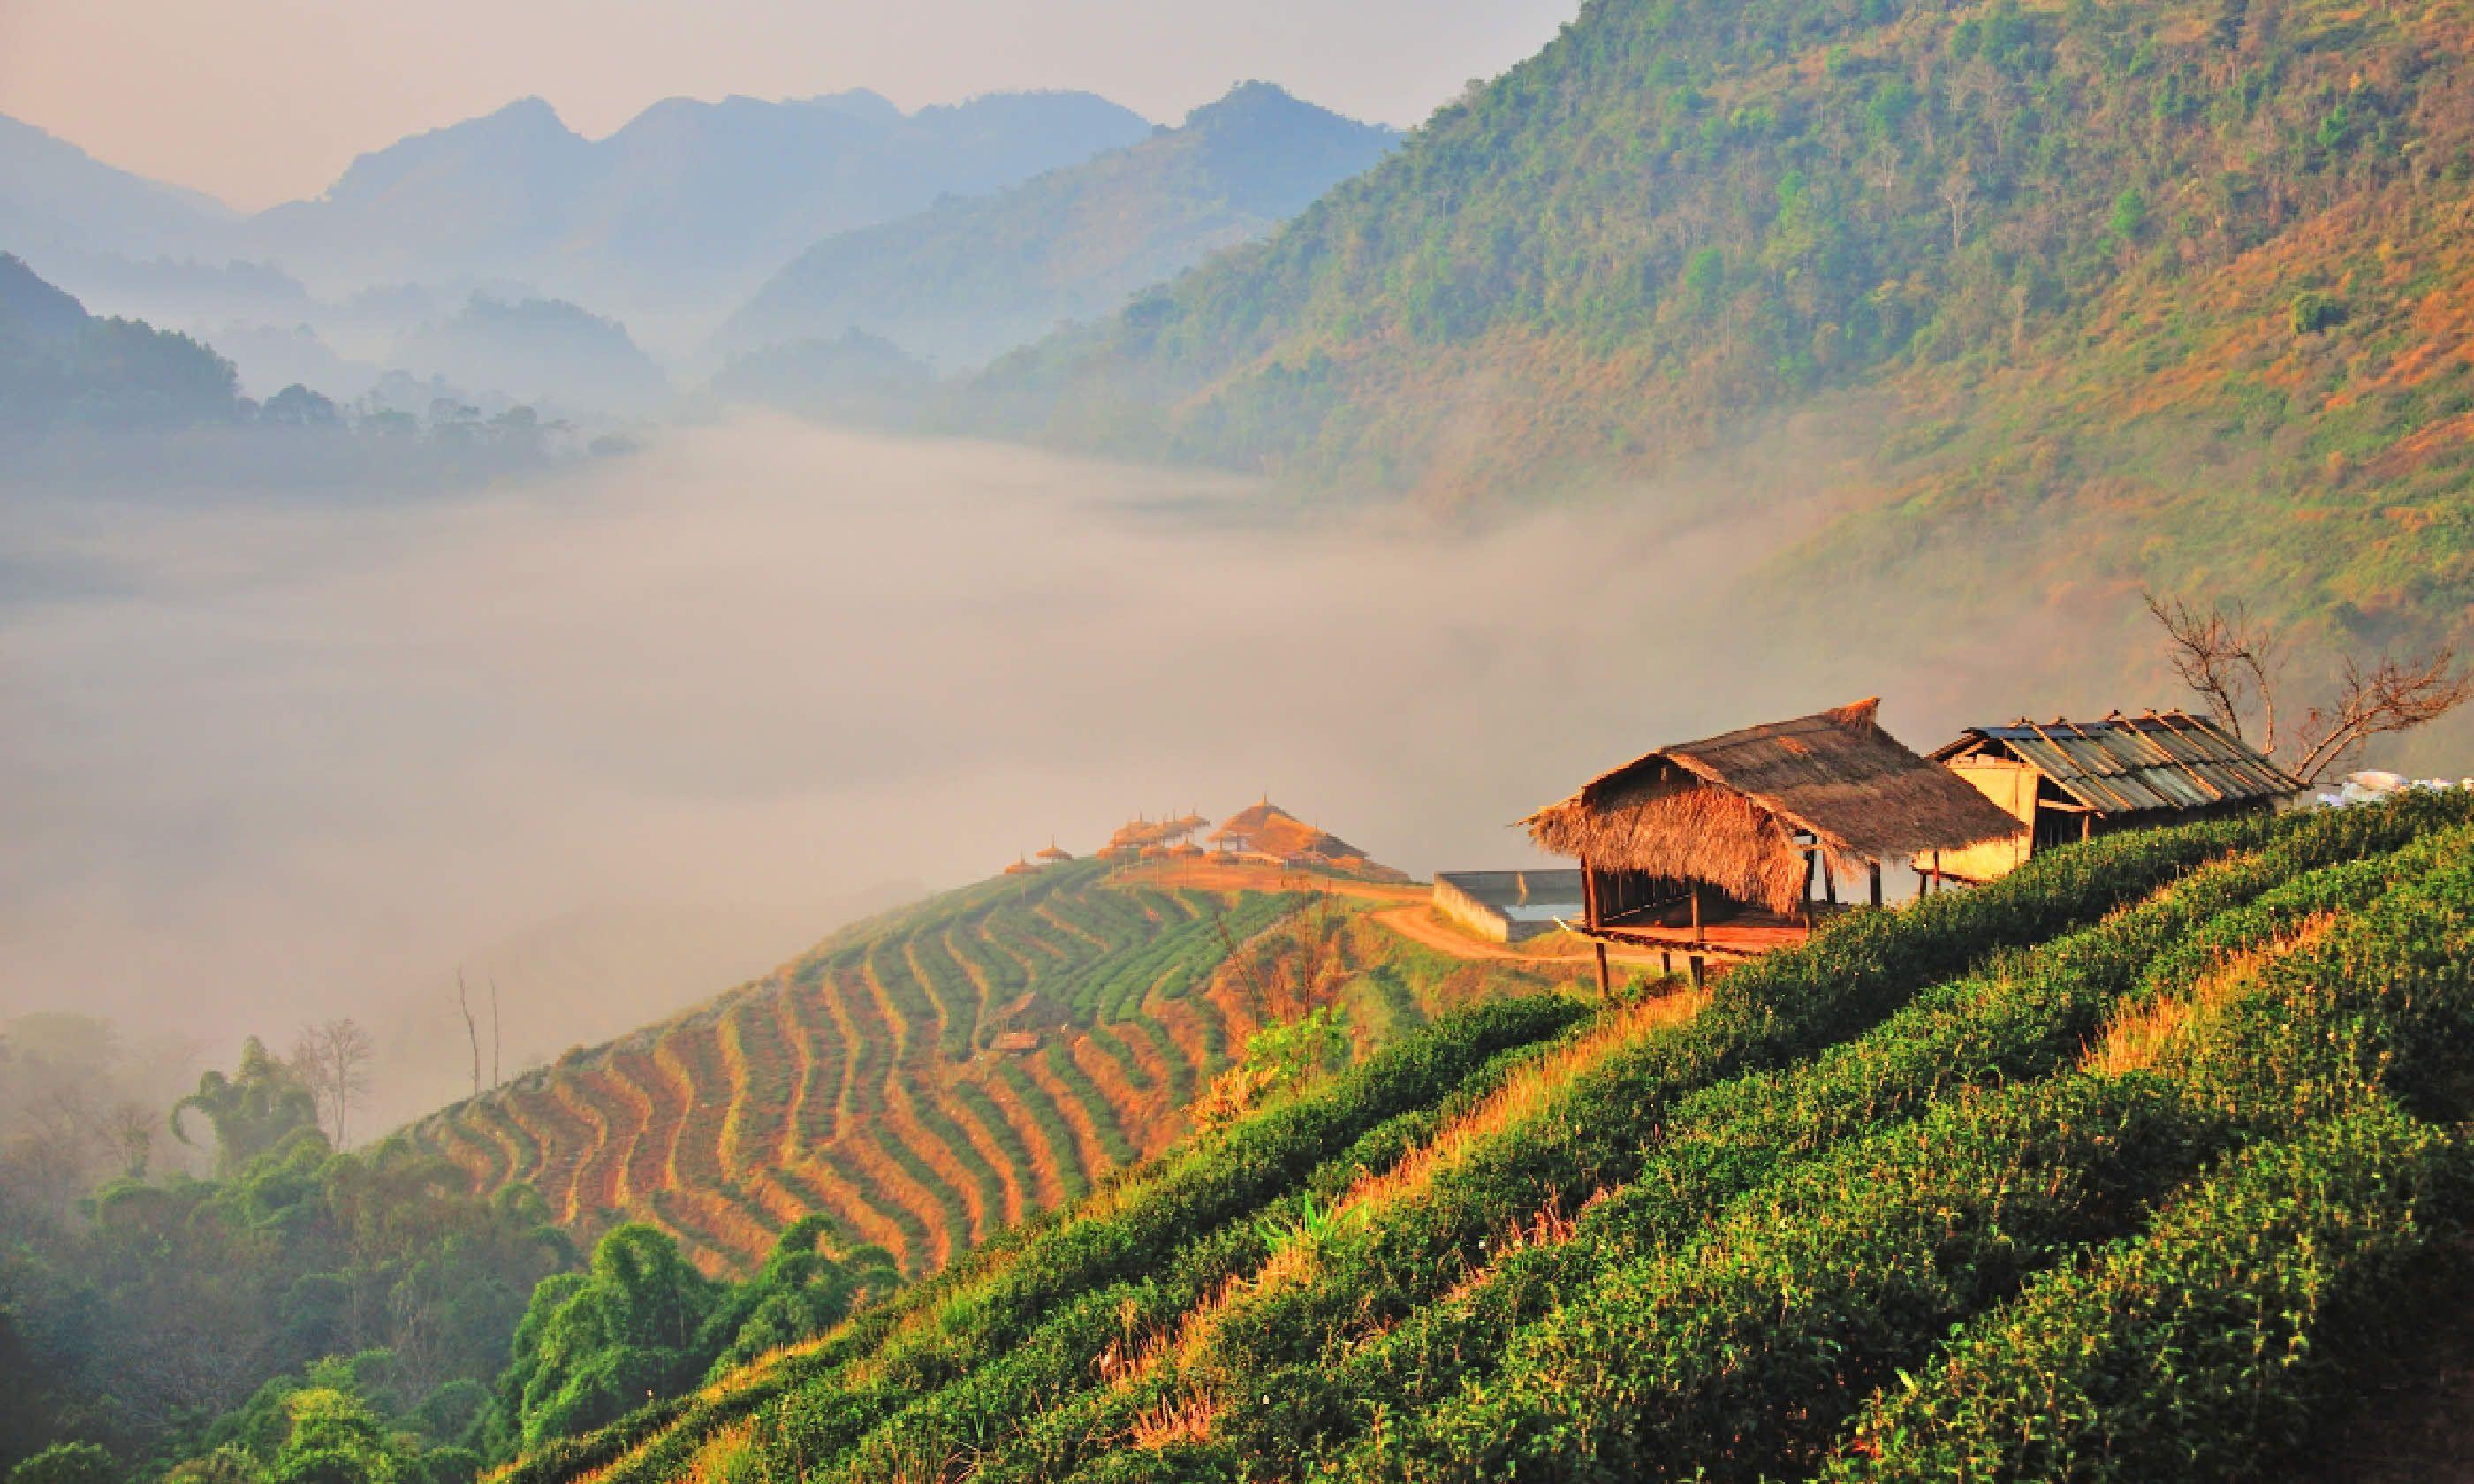 Tea plantation hut in Chiang Mai, Thailand (Shutterstock)